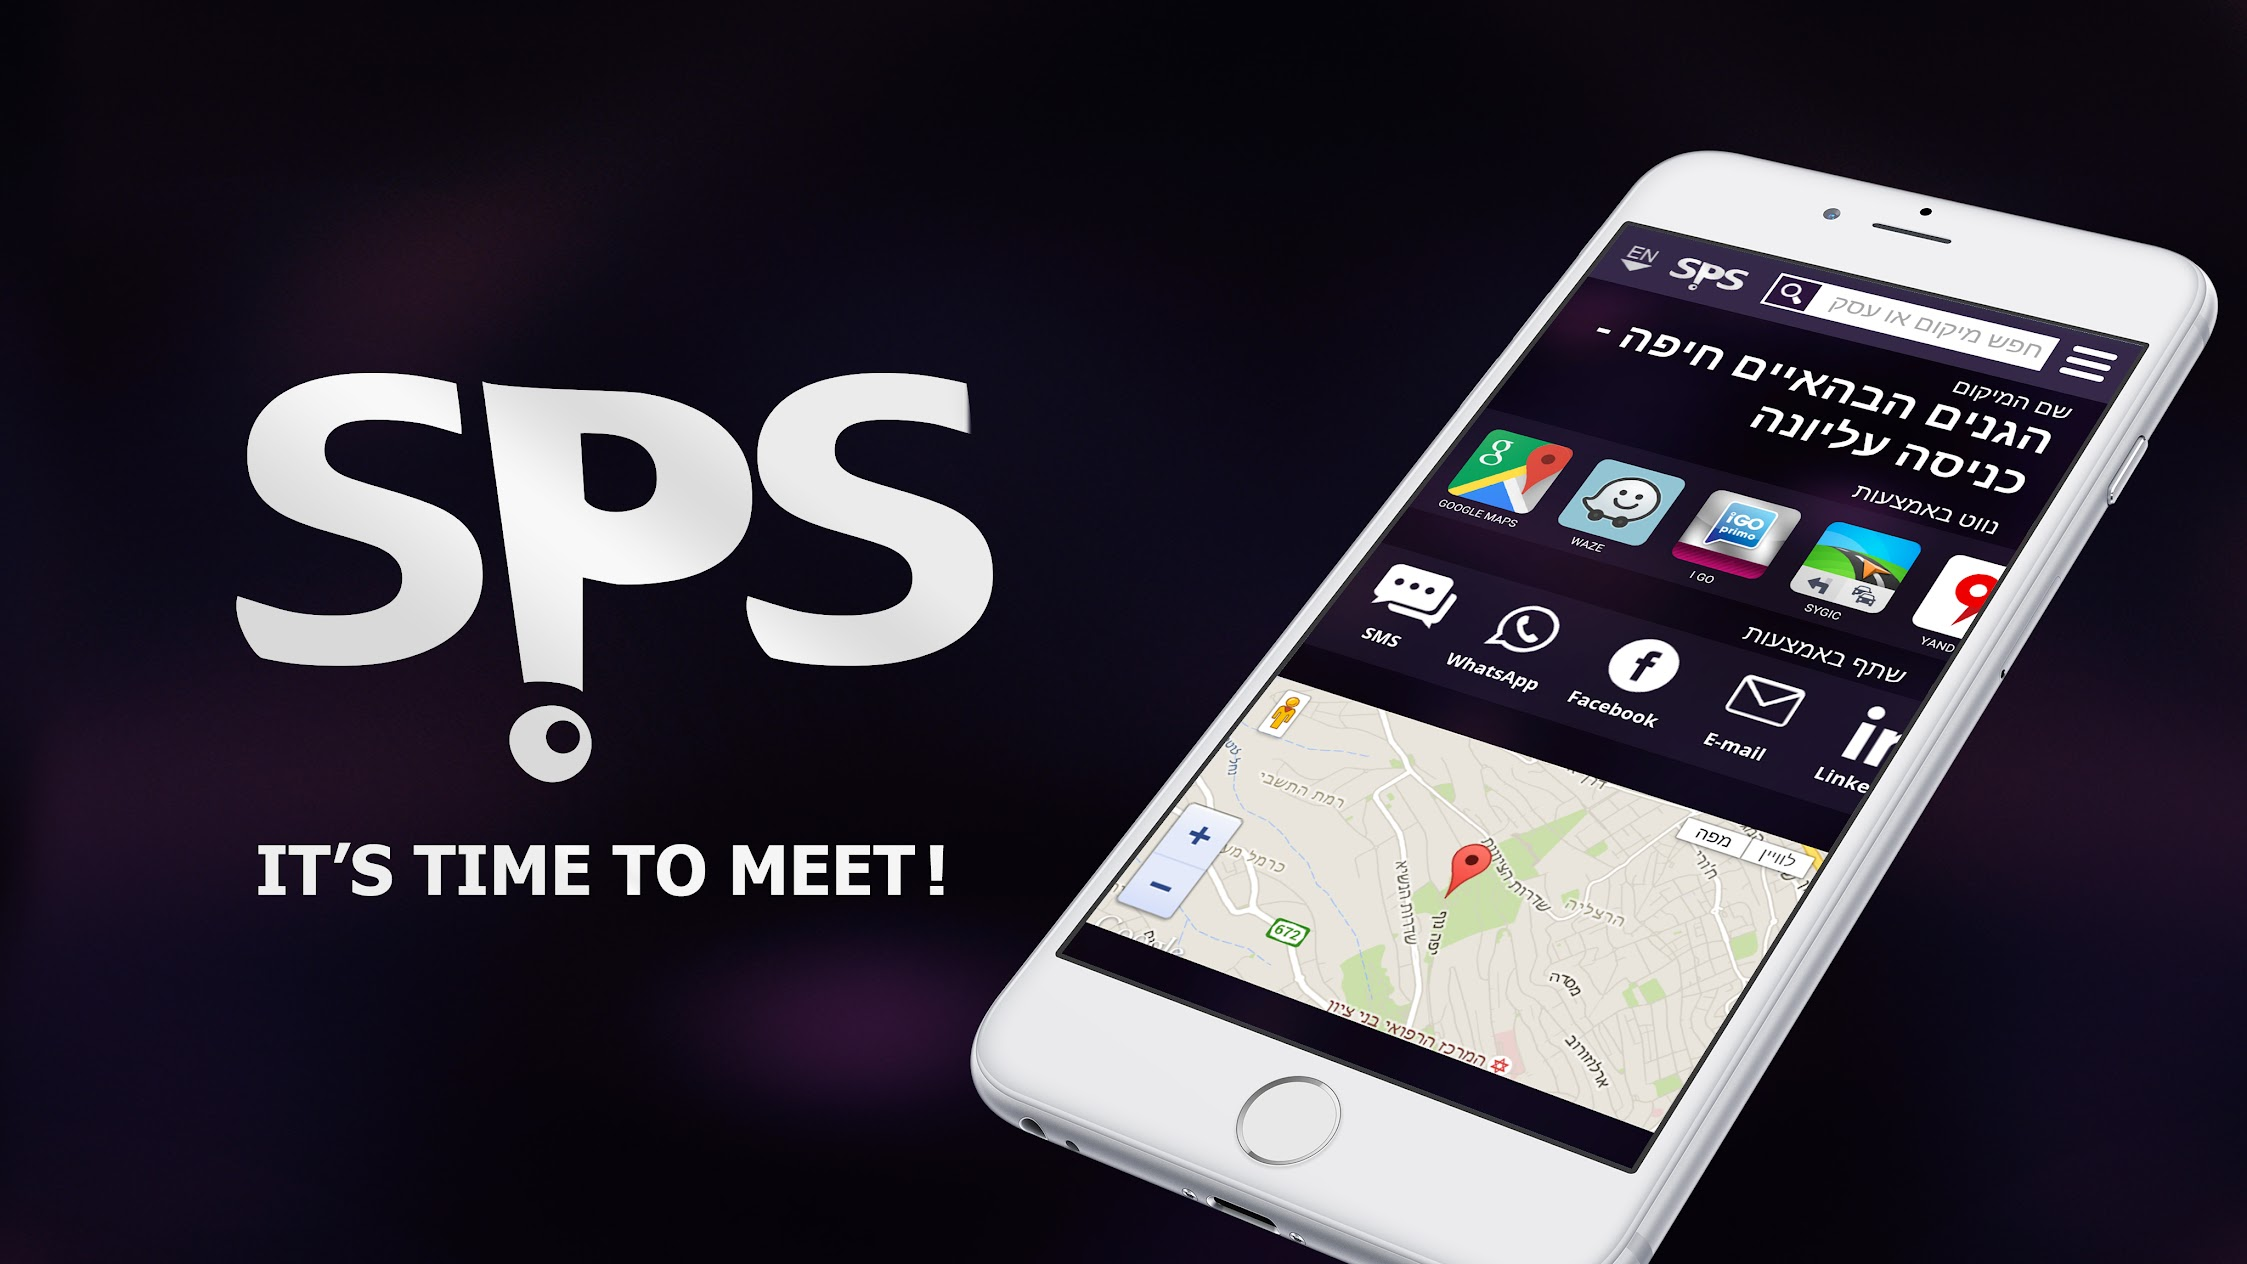 Share GPS Locations PRO